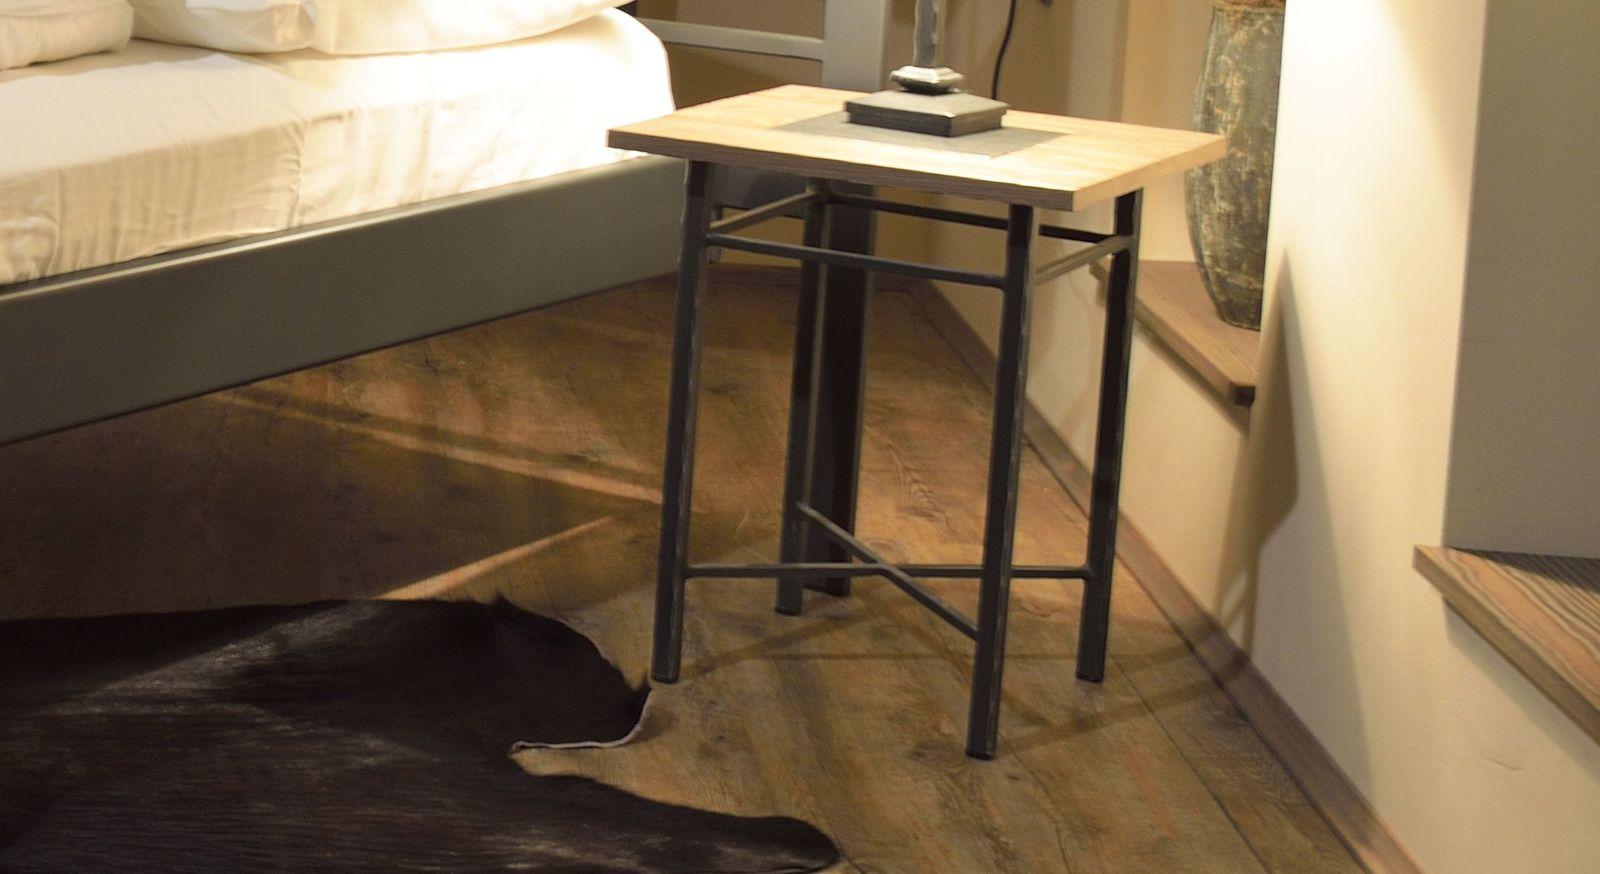 Metall-Nachttisch Tarvisio passend zum Bett